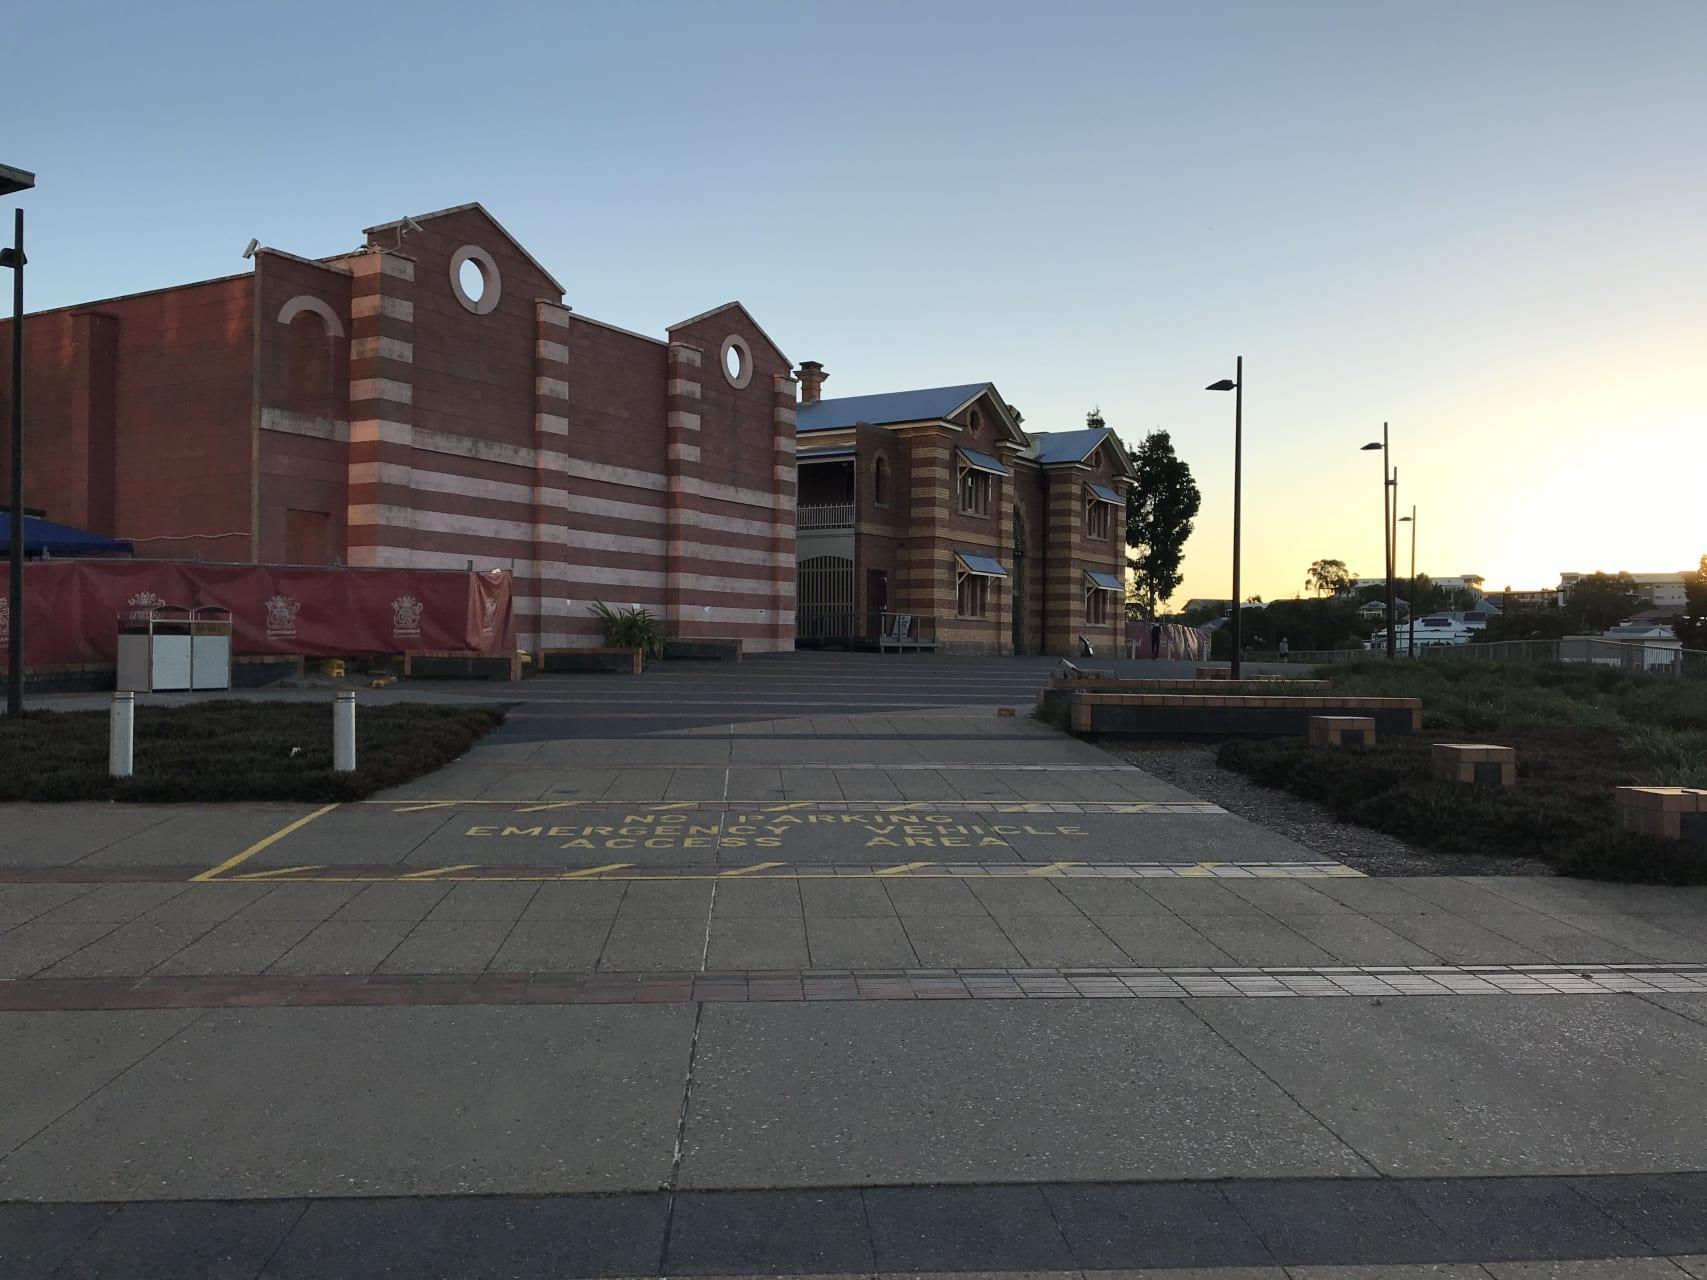 Brisbane - The Gabba: Prison, Plague and Discrimination